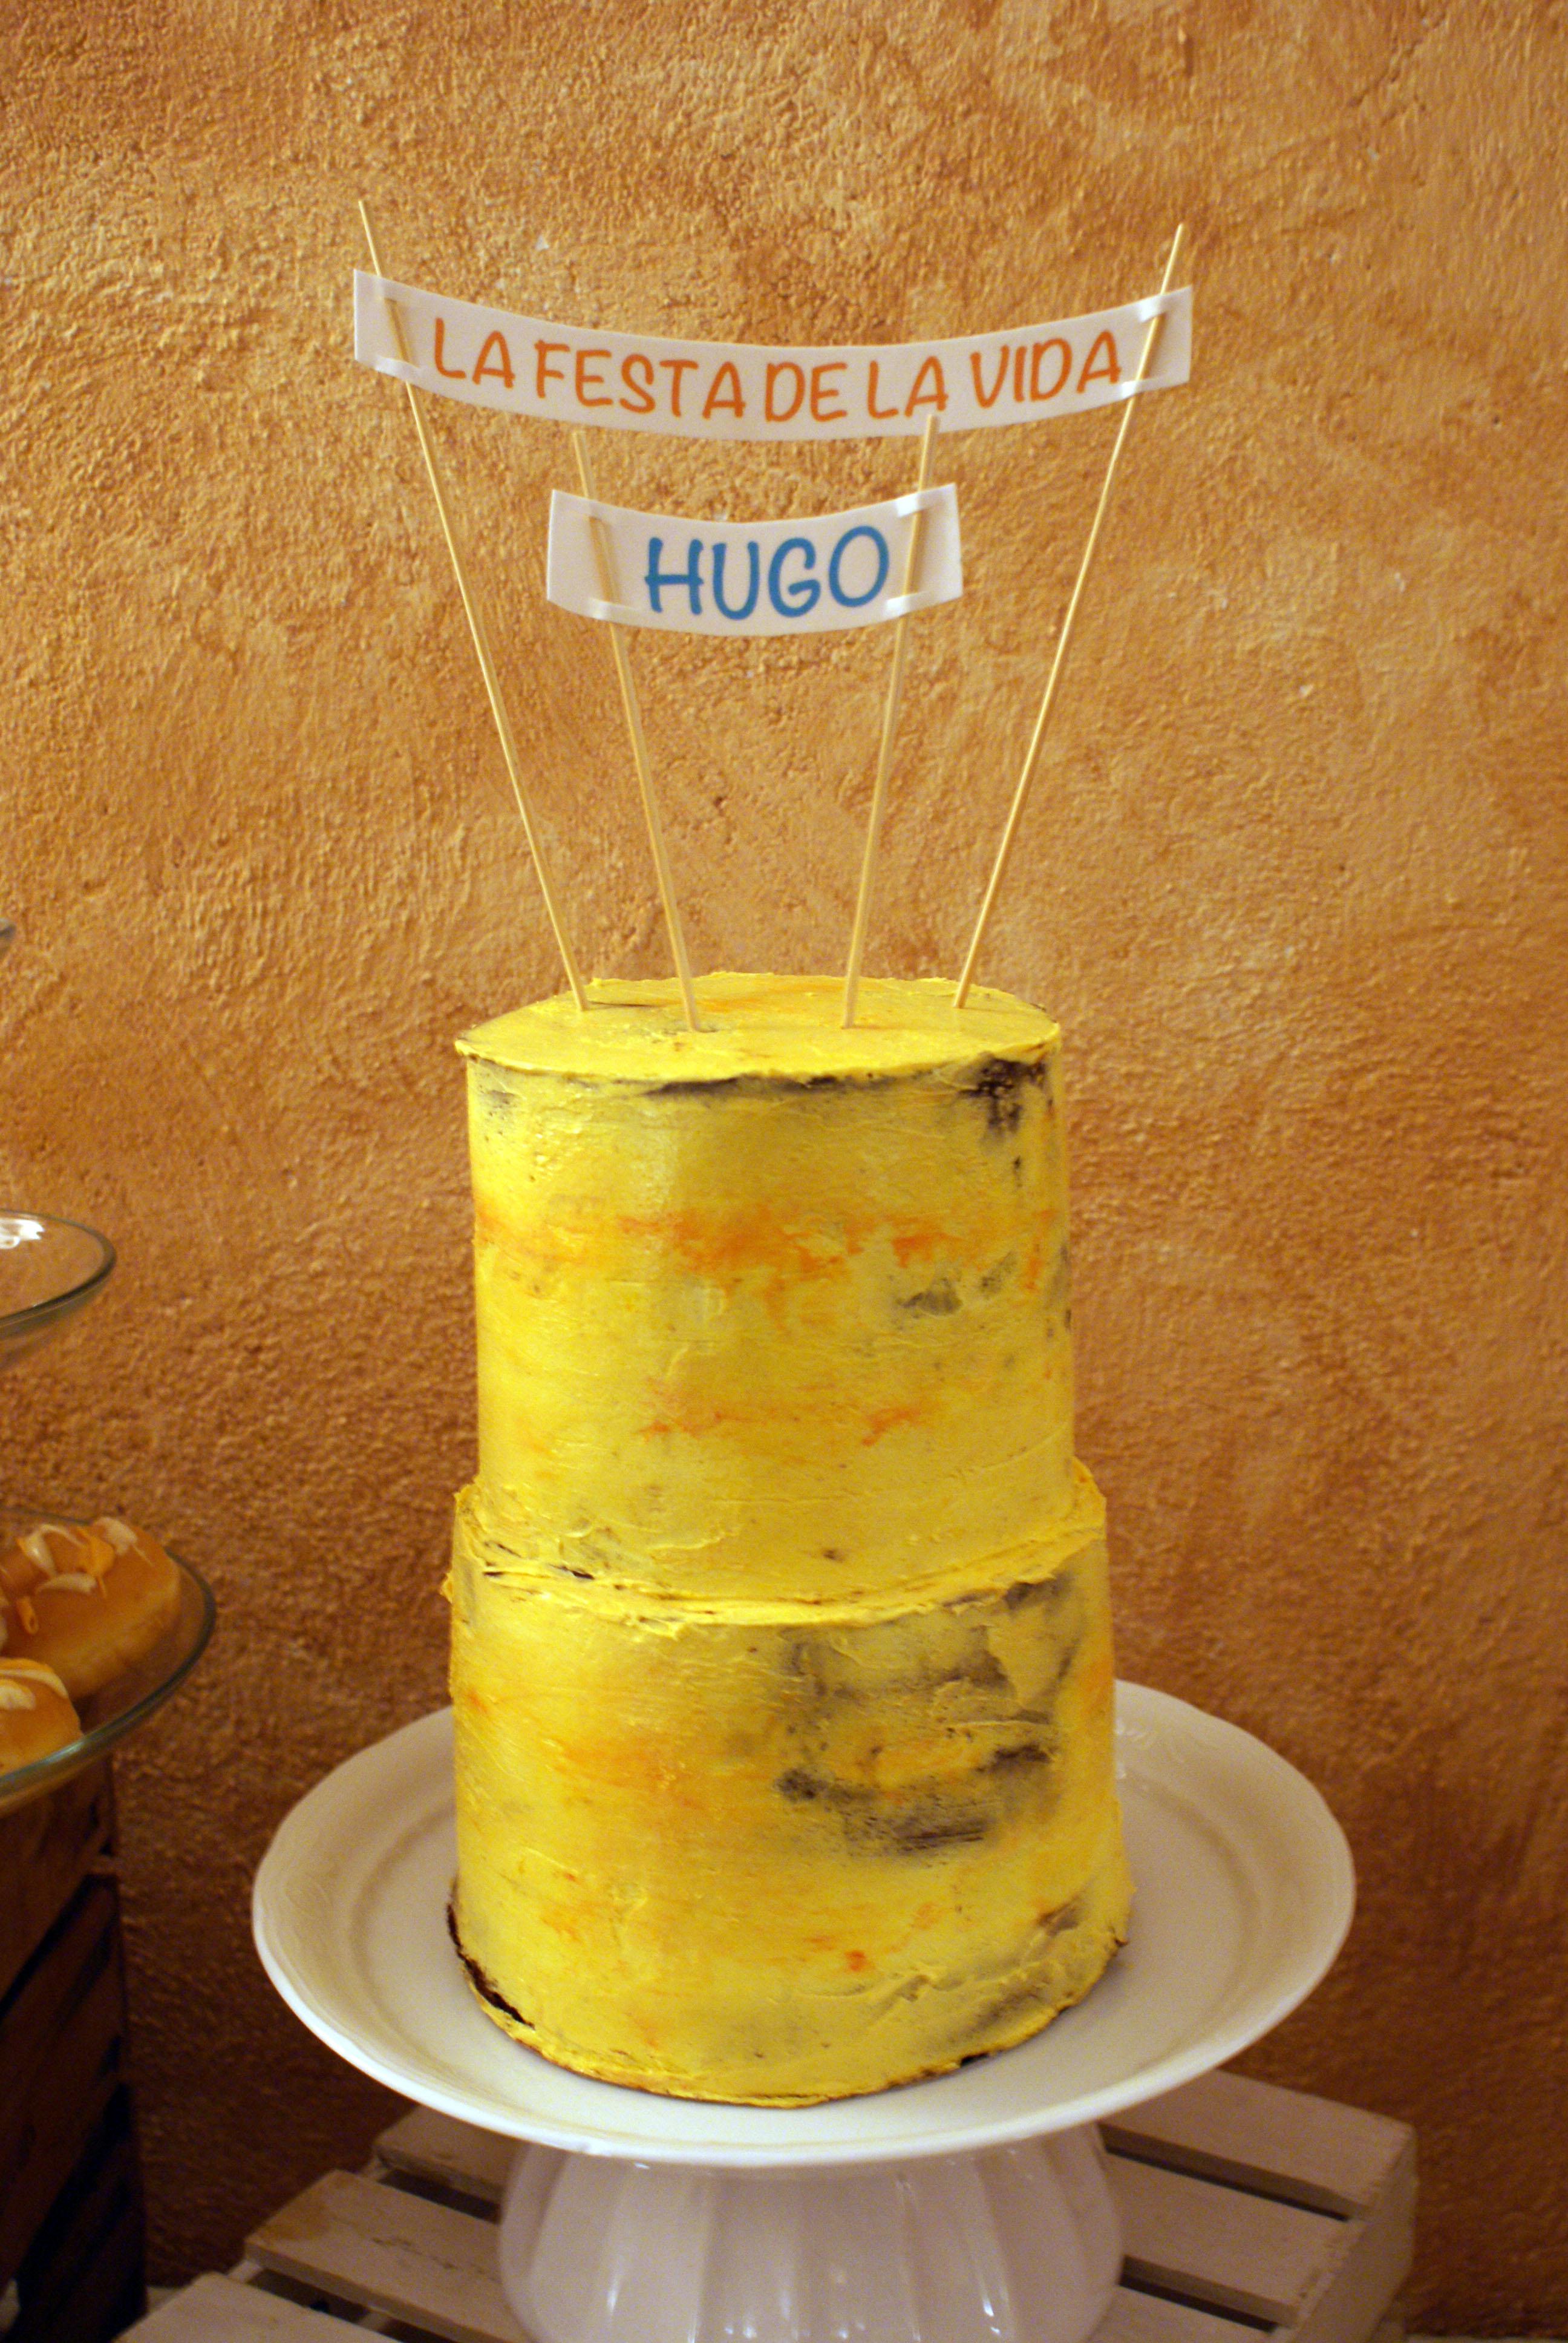 Hugo11.jpg